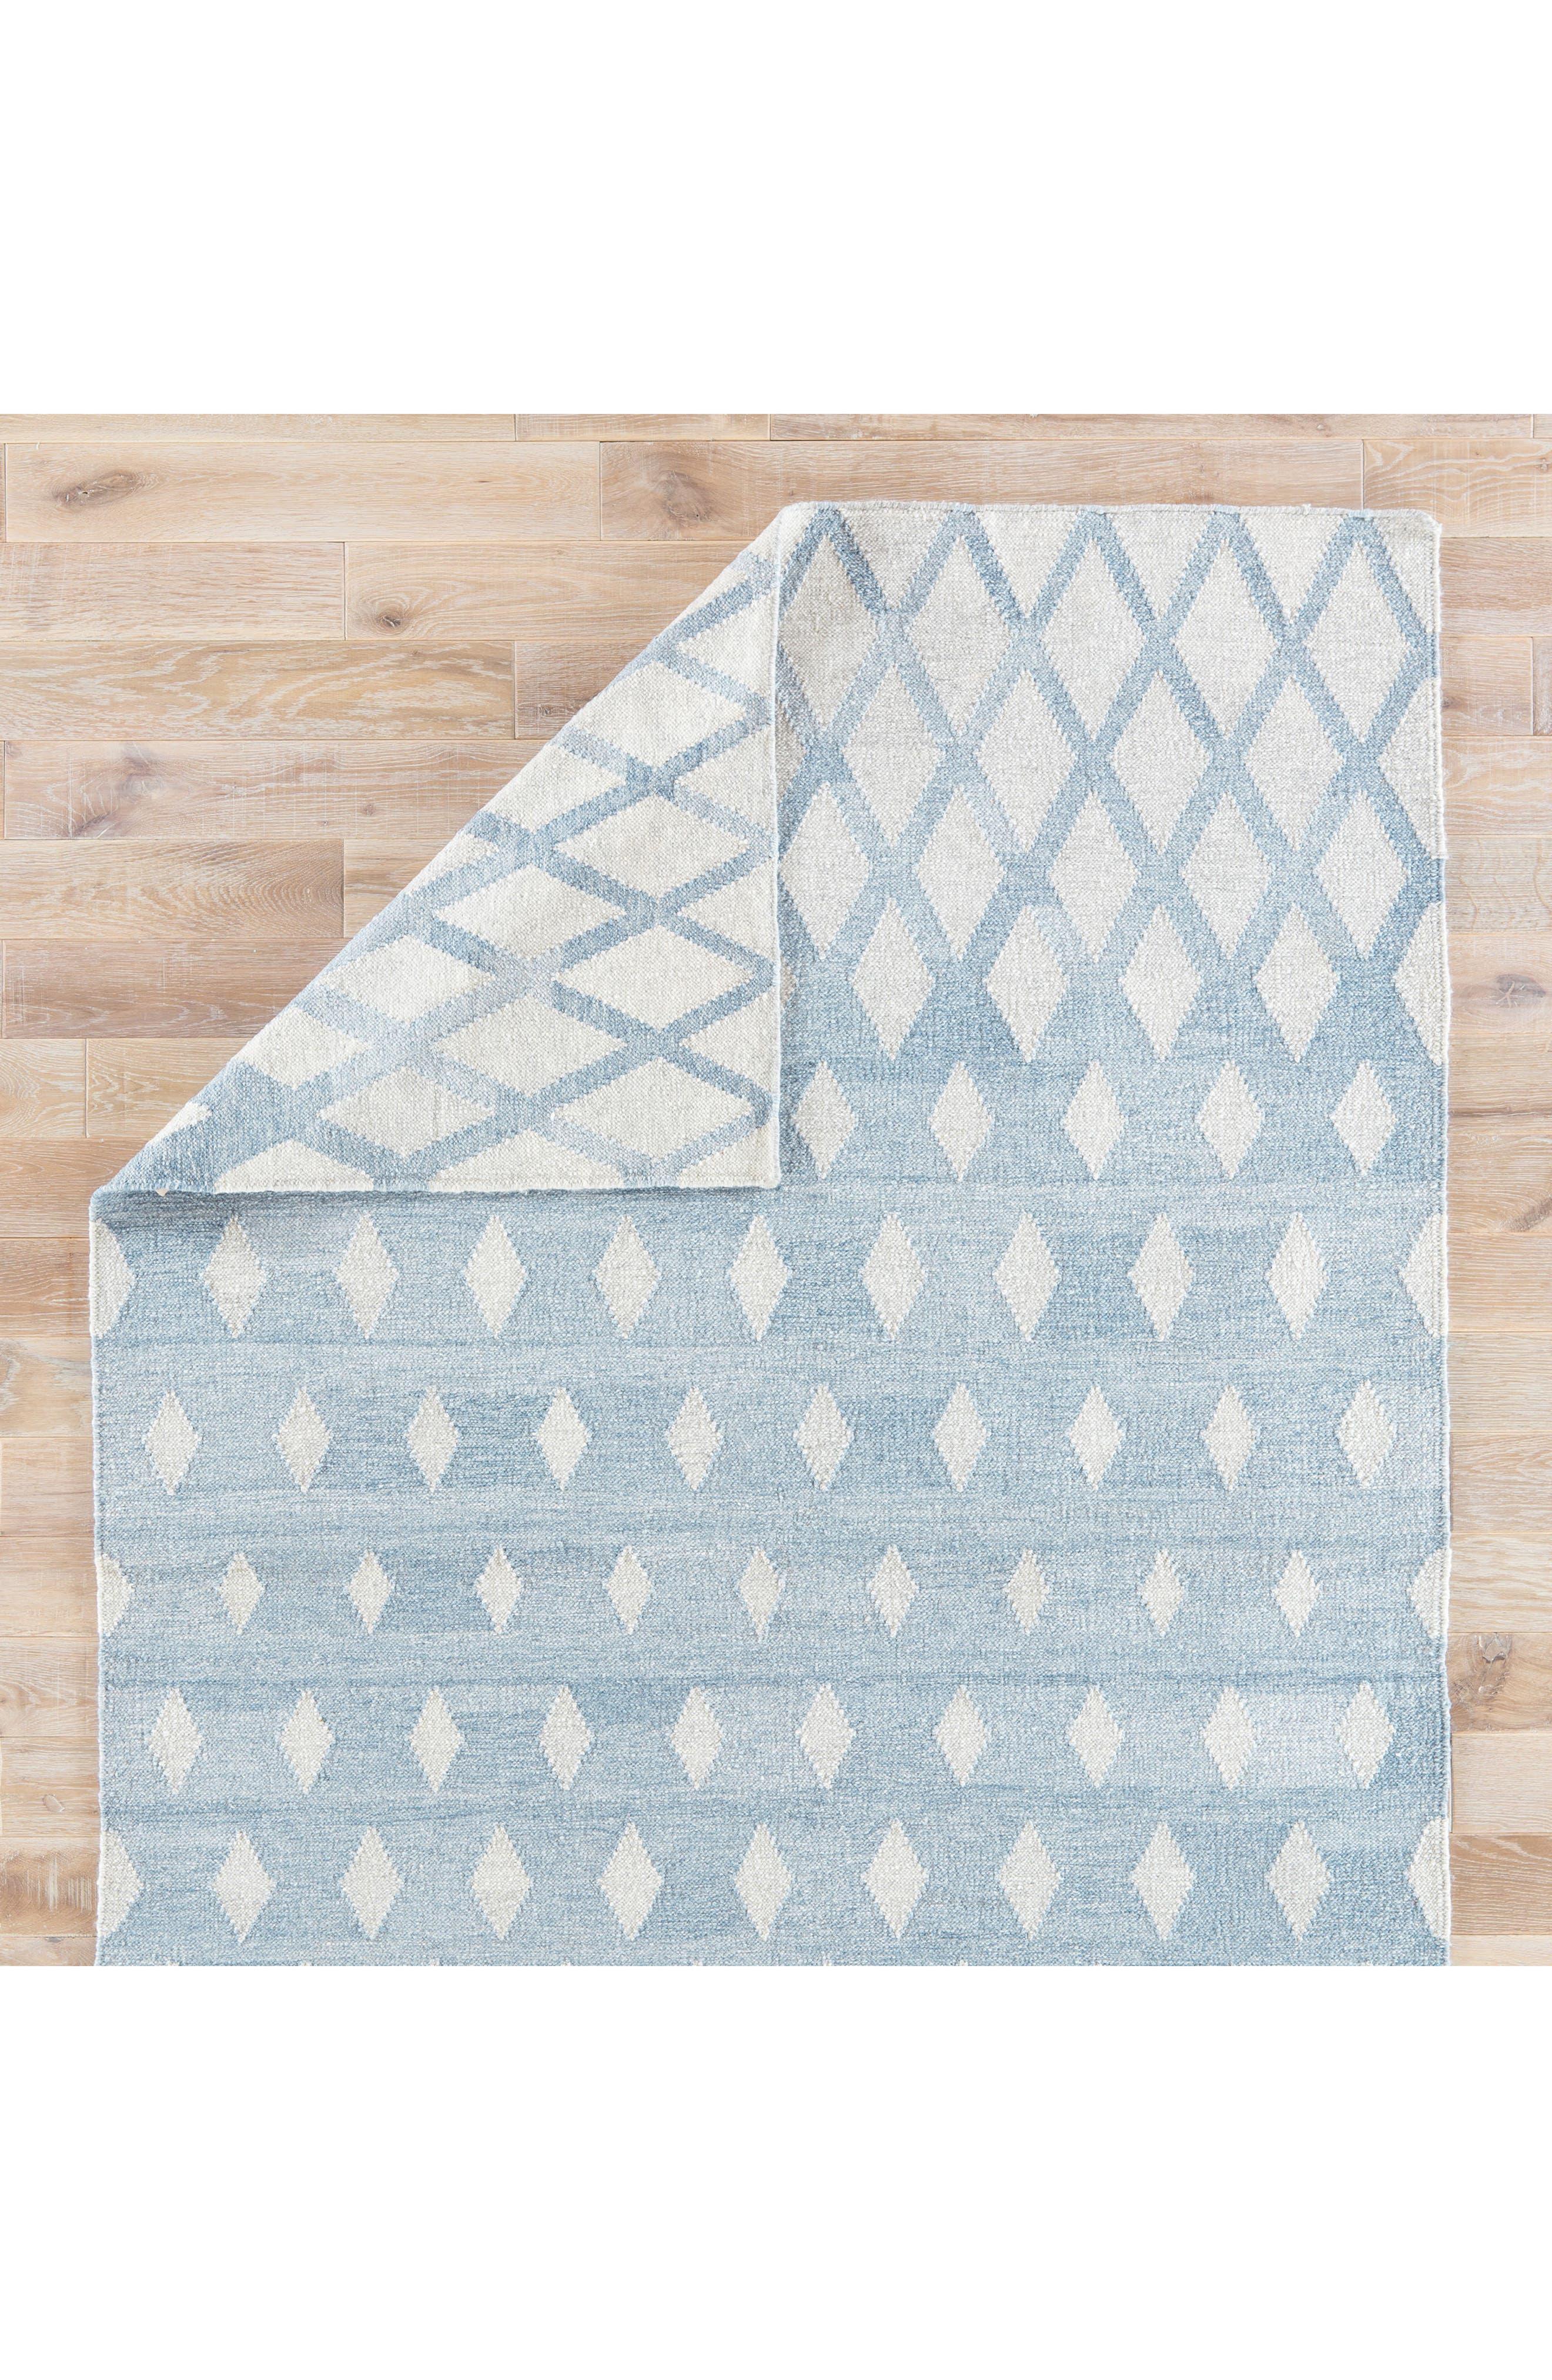 Pyramid Blocks Rug,                             Alternate thumbnail 14, color,